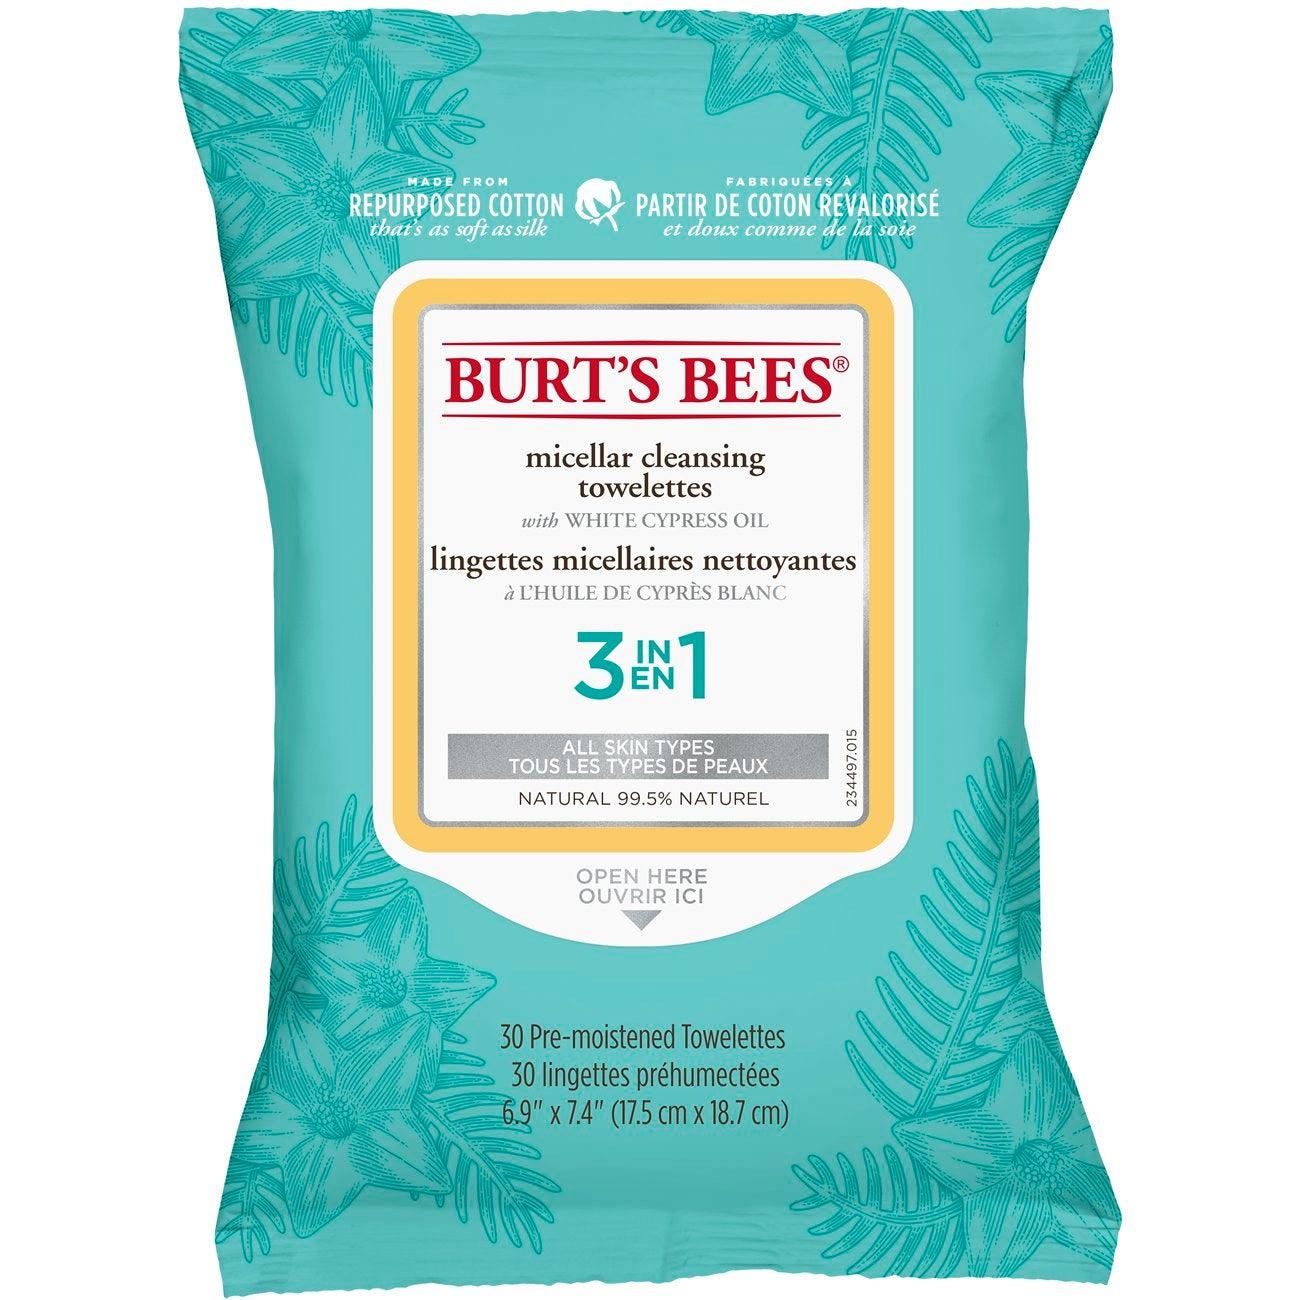 Toallitas Desmaquillantes - Burt's Bees® Micellar Cleansing Towelettes